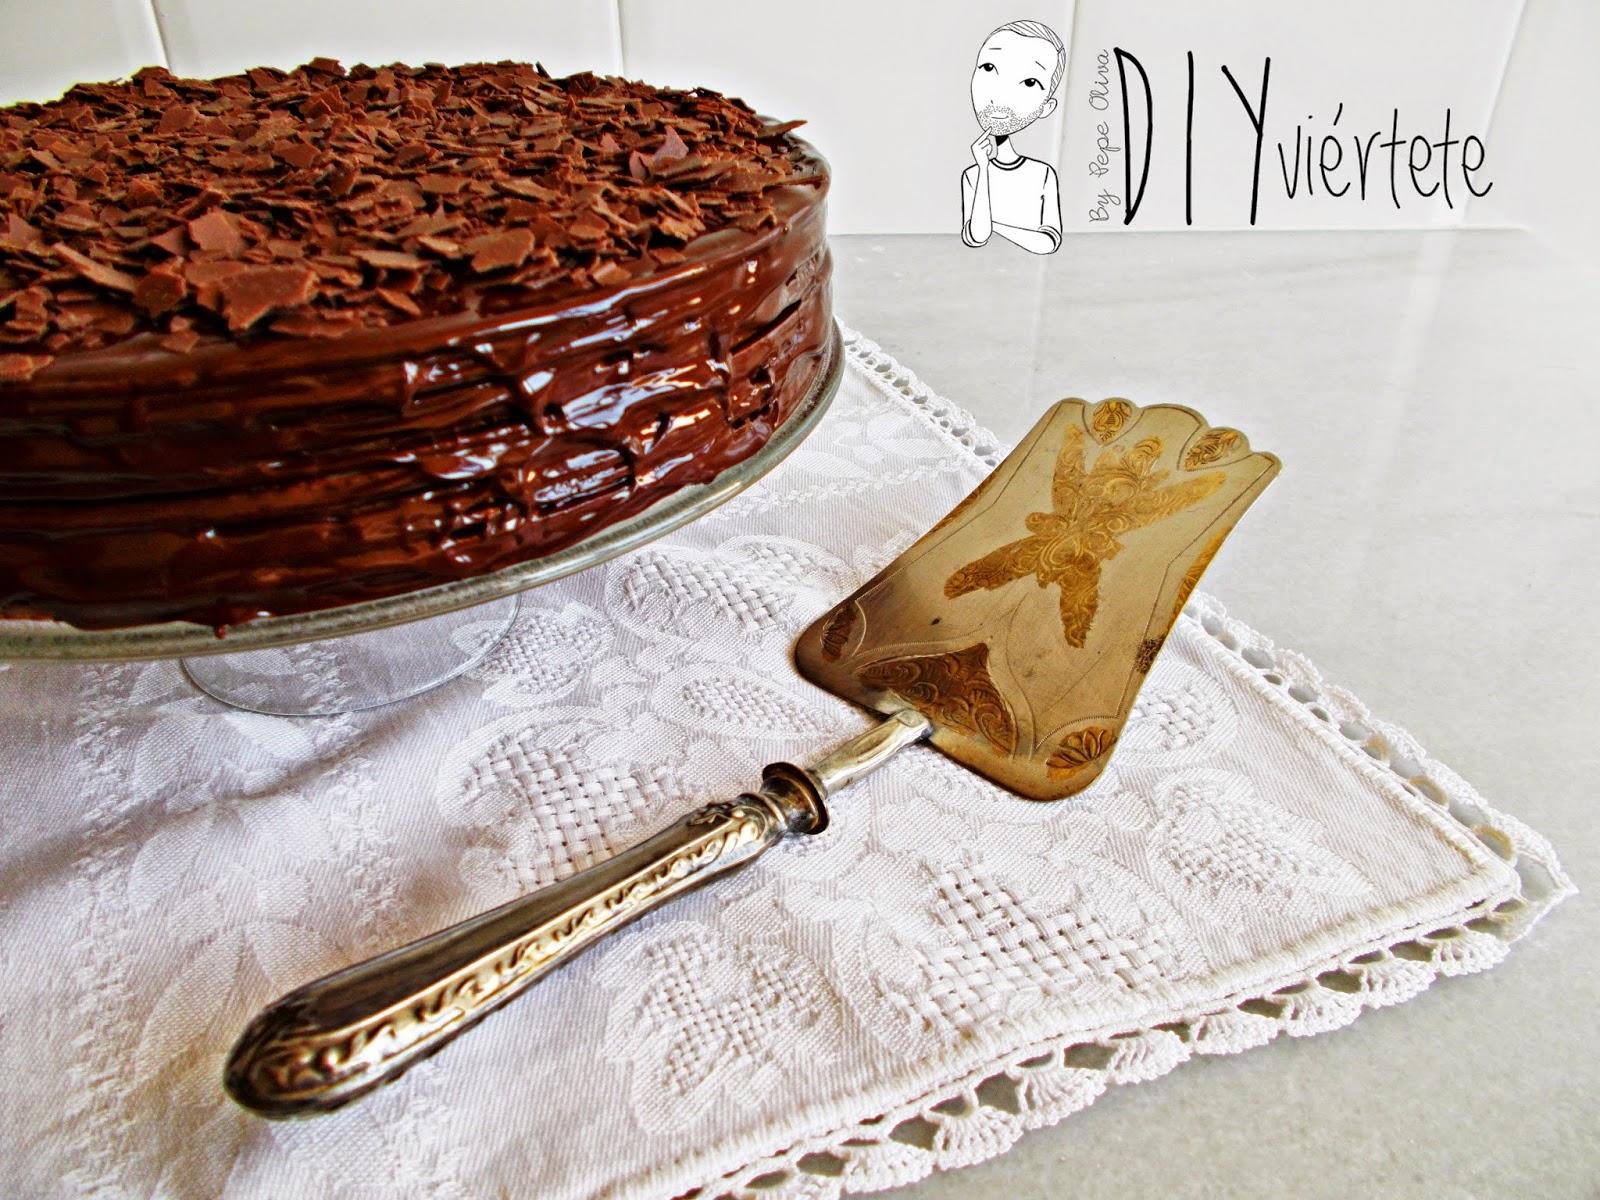 cocina-postre-dulce-pastel-tarta-huesitos-chocolate-obleas-nutella-2